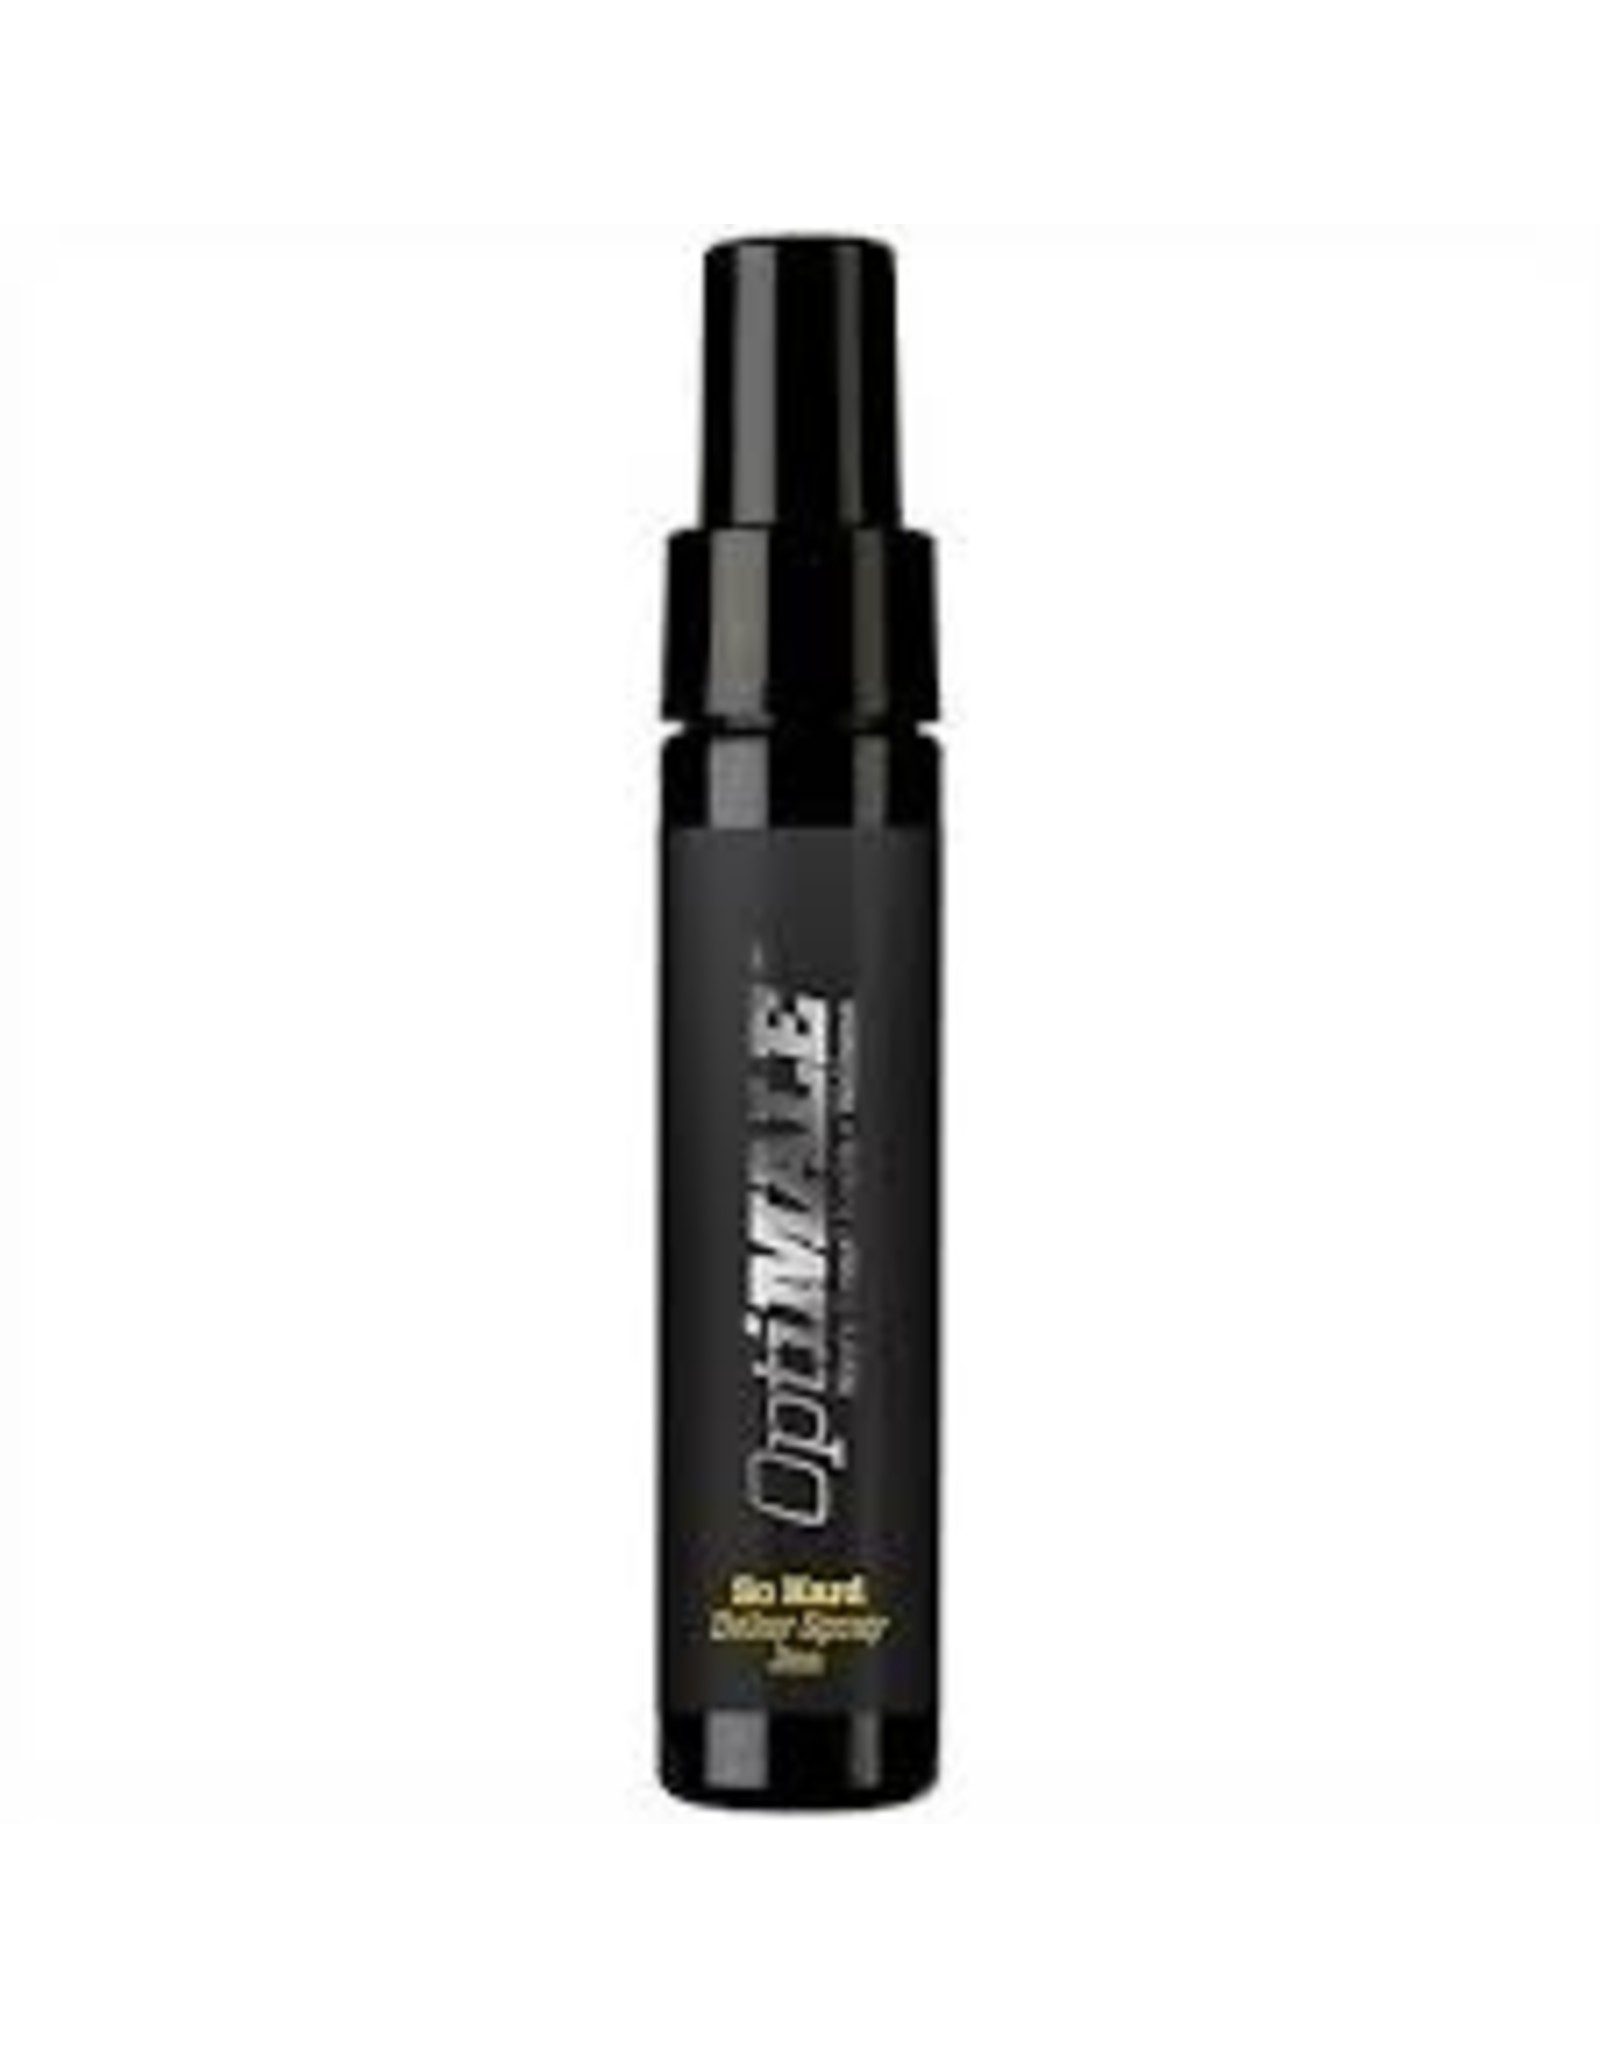 OptiMALE – So Hard – Delay Spray 2oz